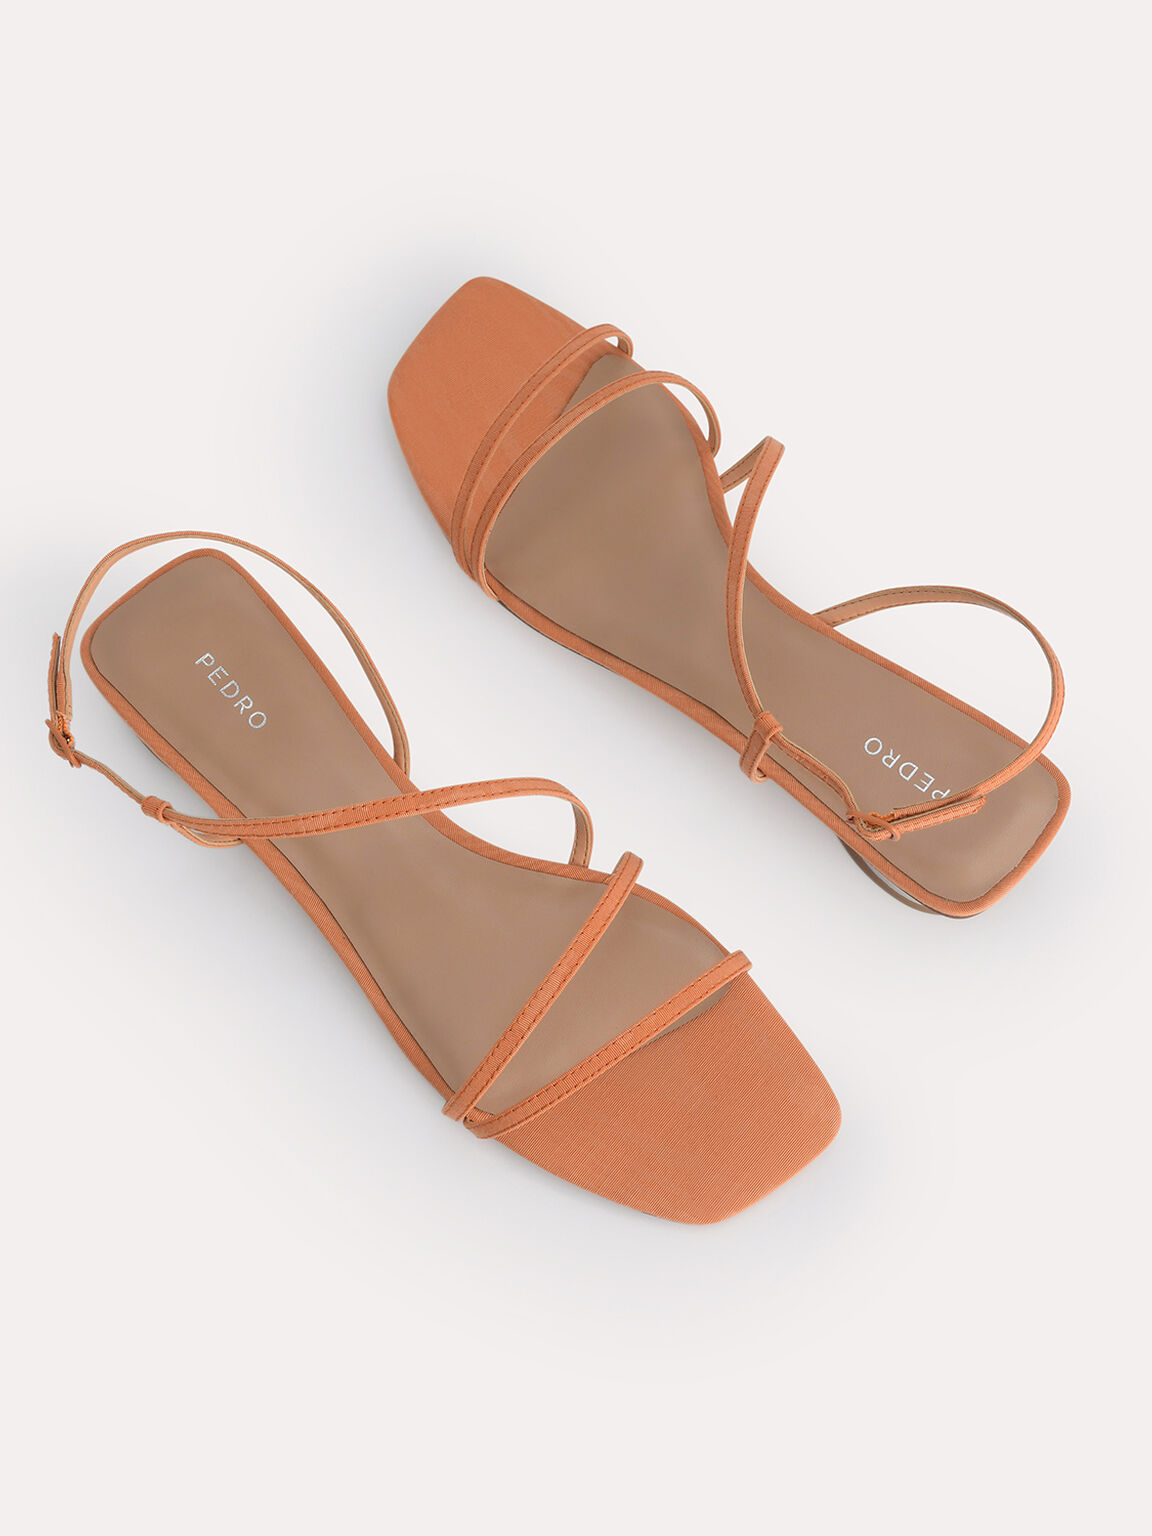 Wraparound Strappy Flats, Orange, hi-res